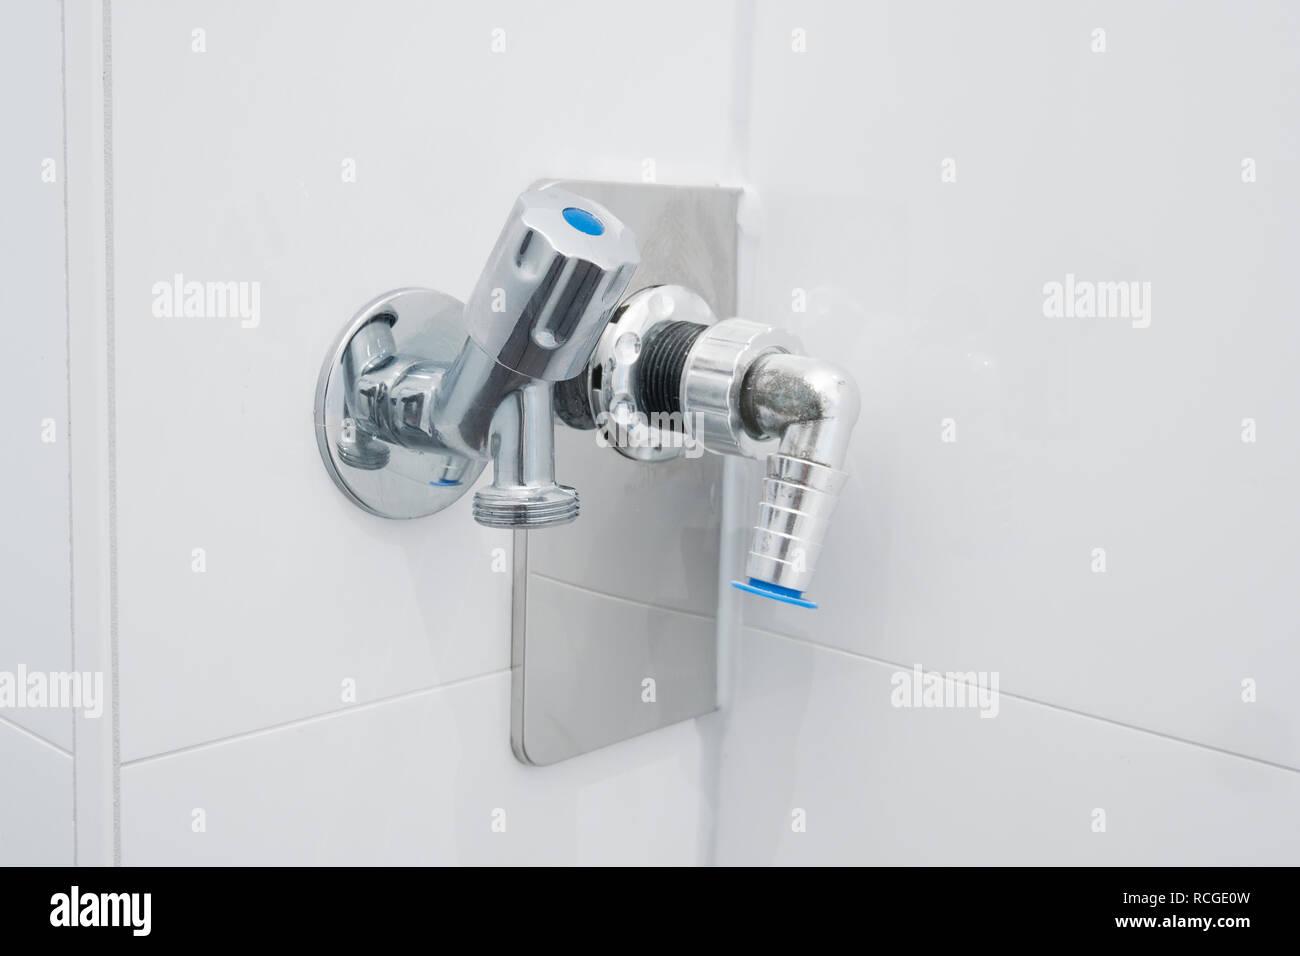 Wasserhahn Anschluss Stockfotos & Wasserhahn Anschluss ...